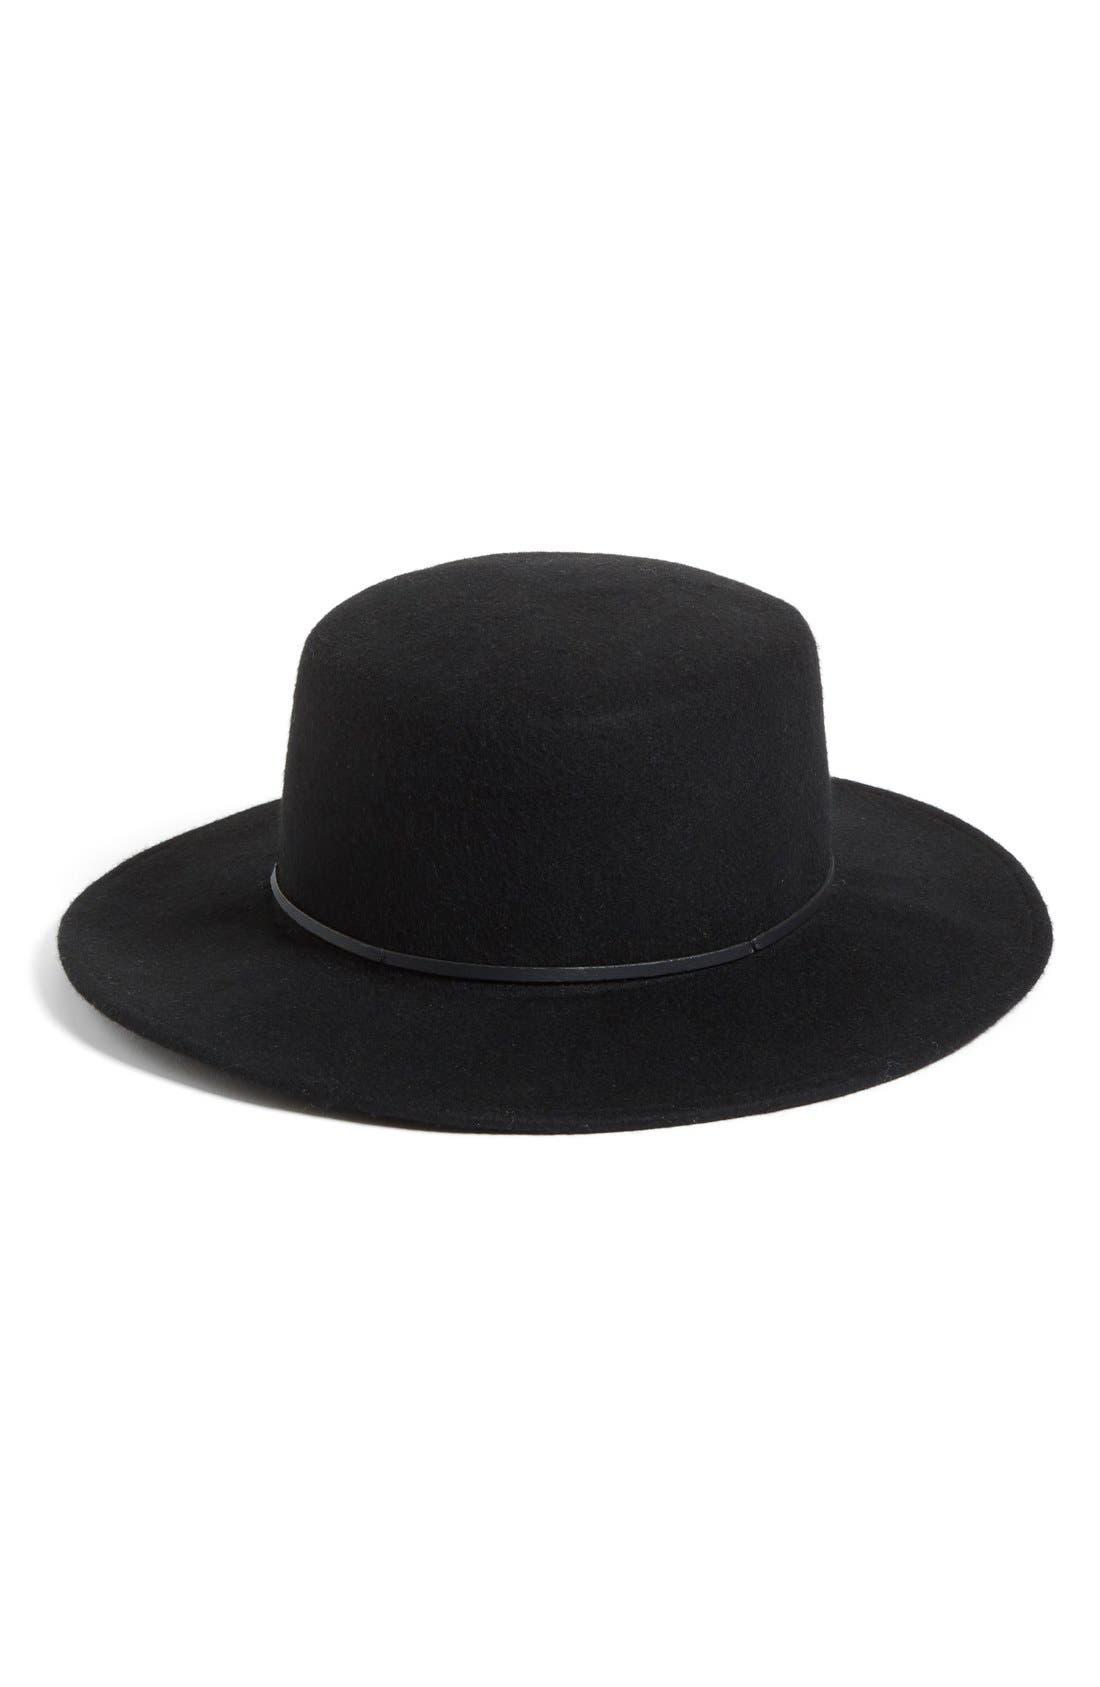 Flat Brim Felt Hat,                             Main thumbnail 1, color,                             001